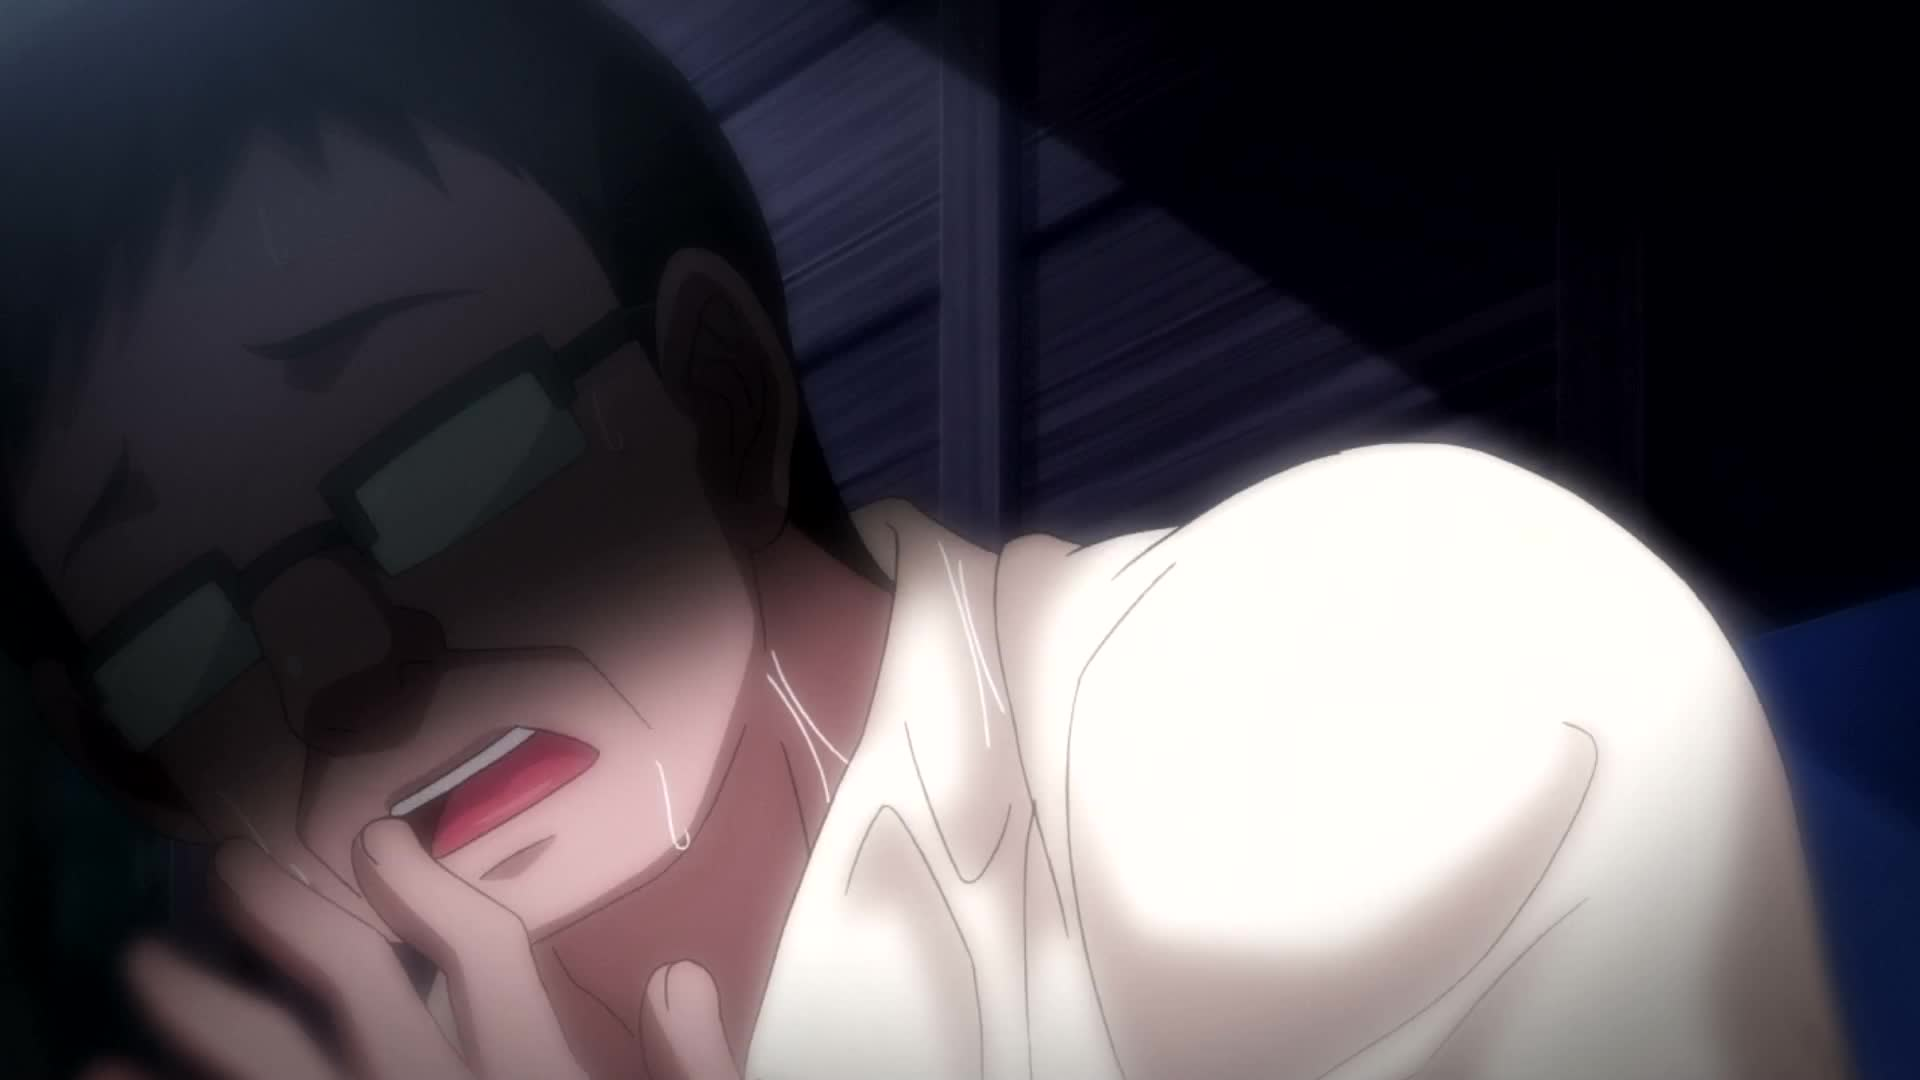 https://anime.h3dhub.com/videos/202006/09/5edeee300b079e794cb00ba6/0.jpg